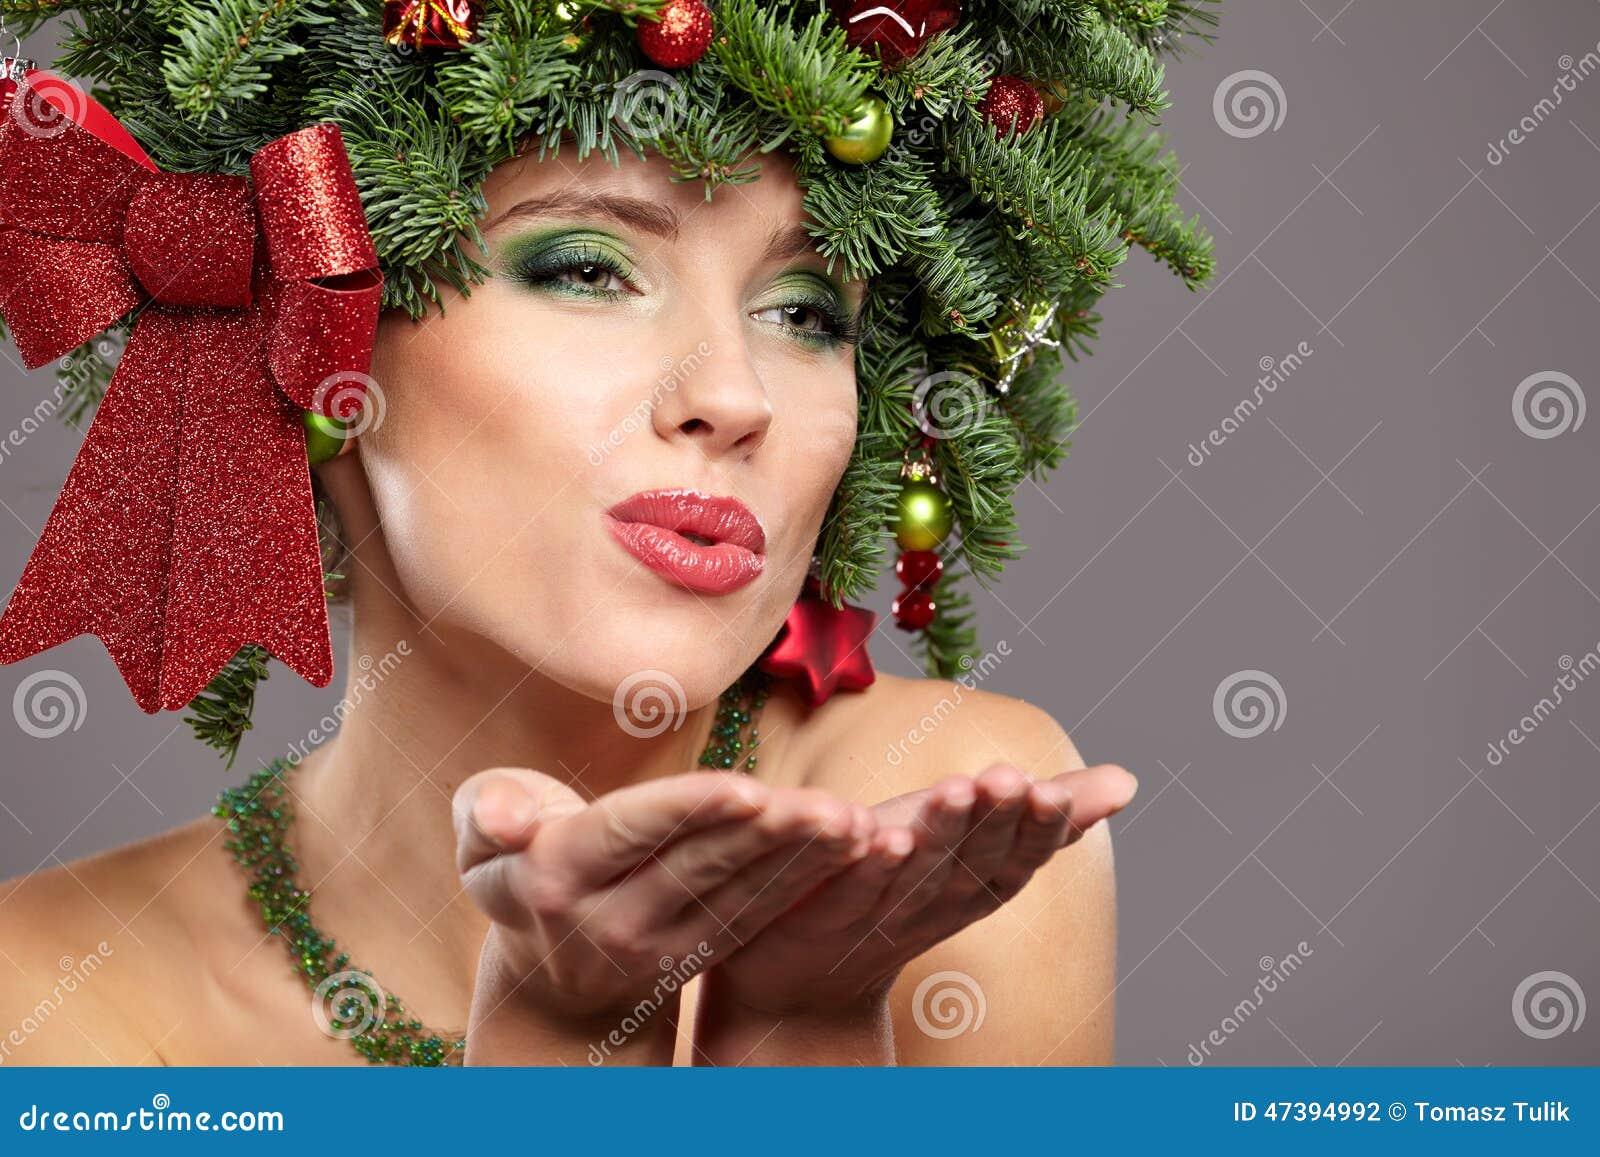 Beautiful Christmas Tree Holiday Hairstyle And Make Stock Photo